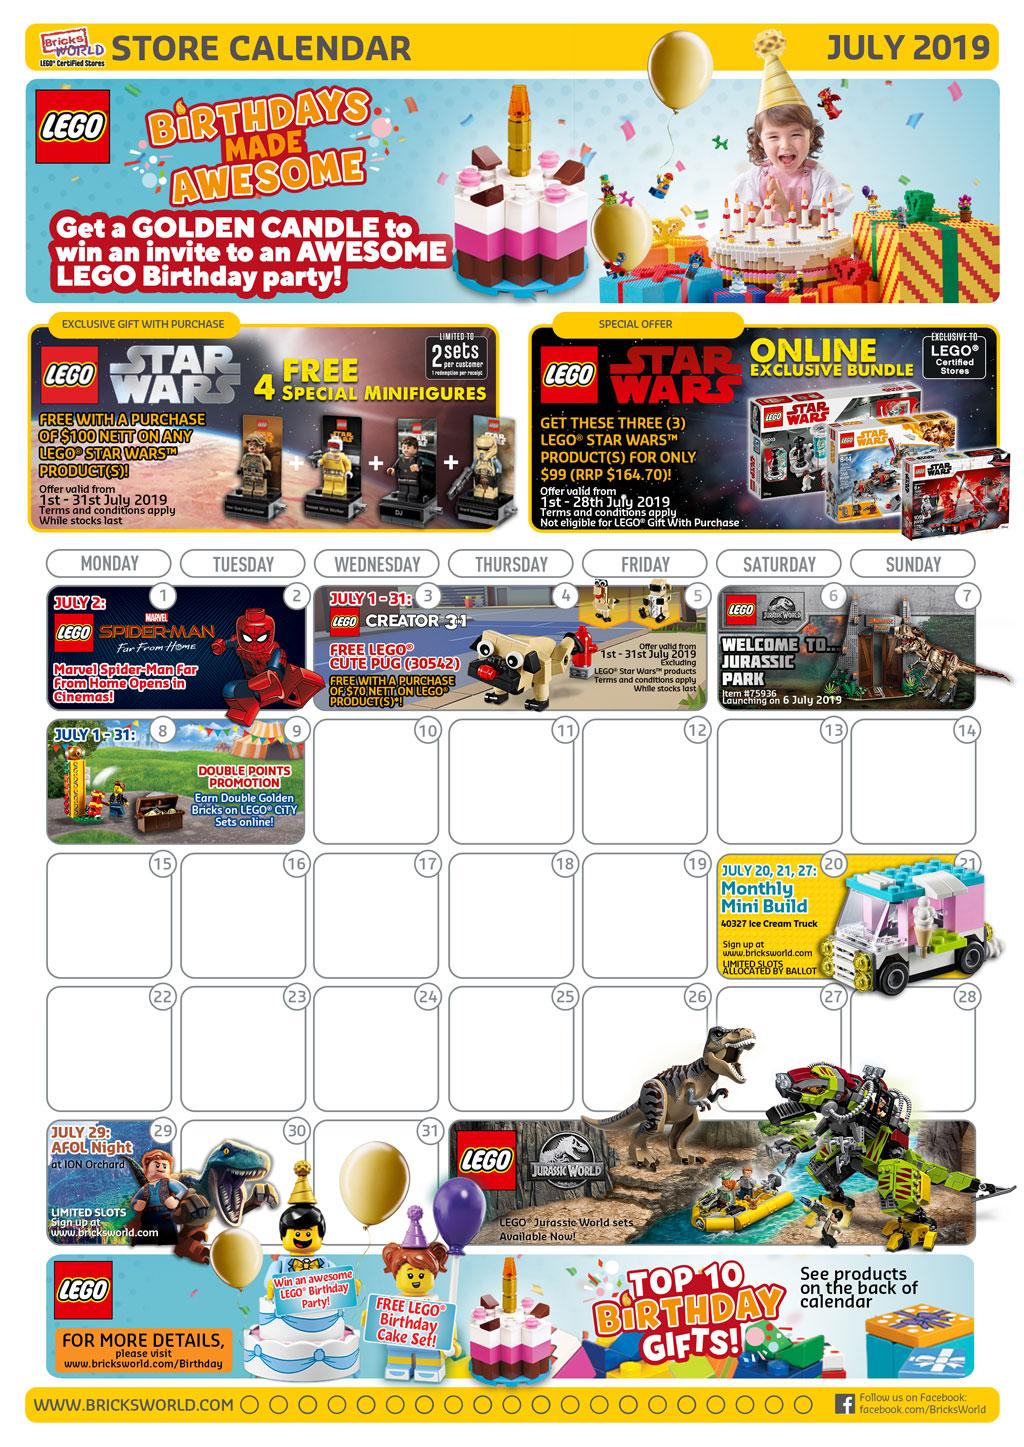 lego-singapur-kalender-juli-2019 zusammengebaut.com